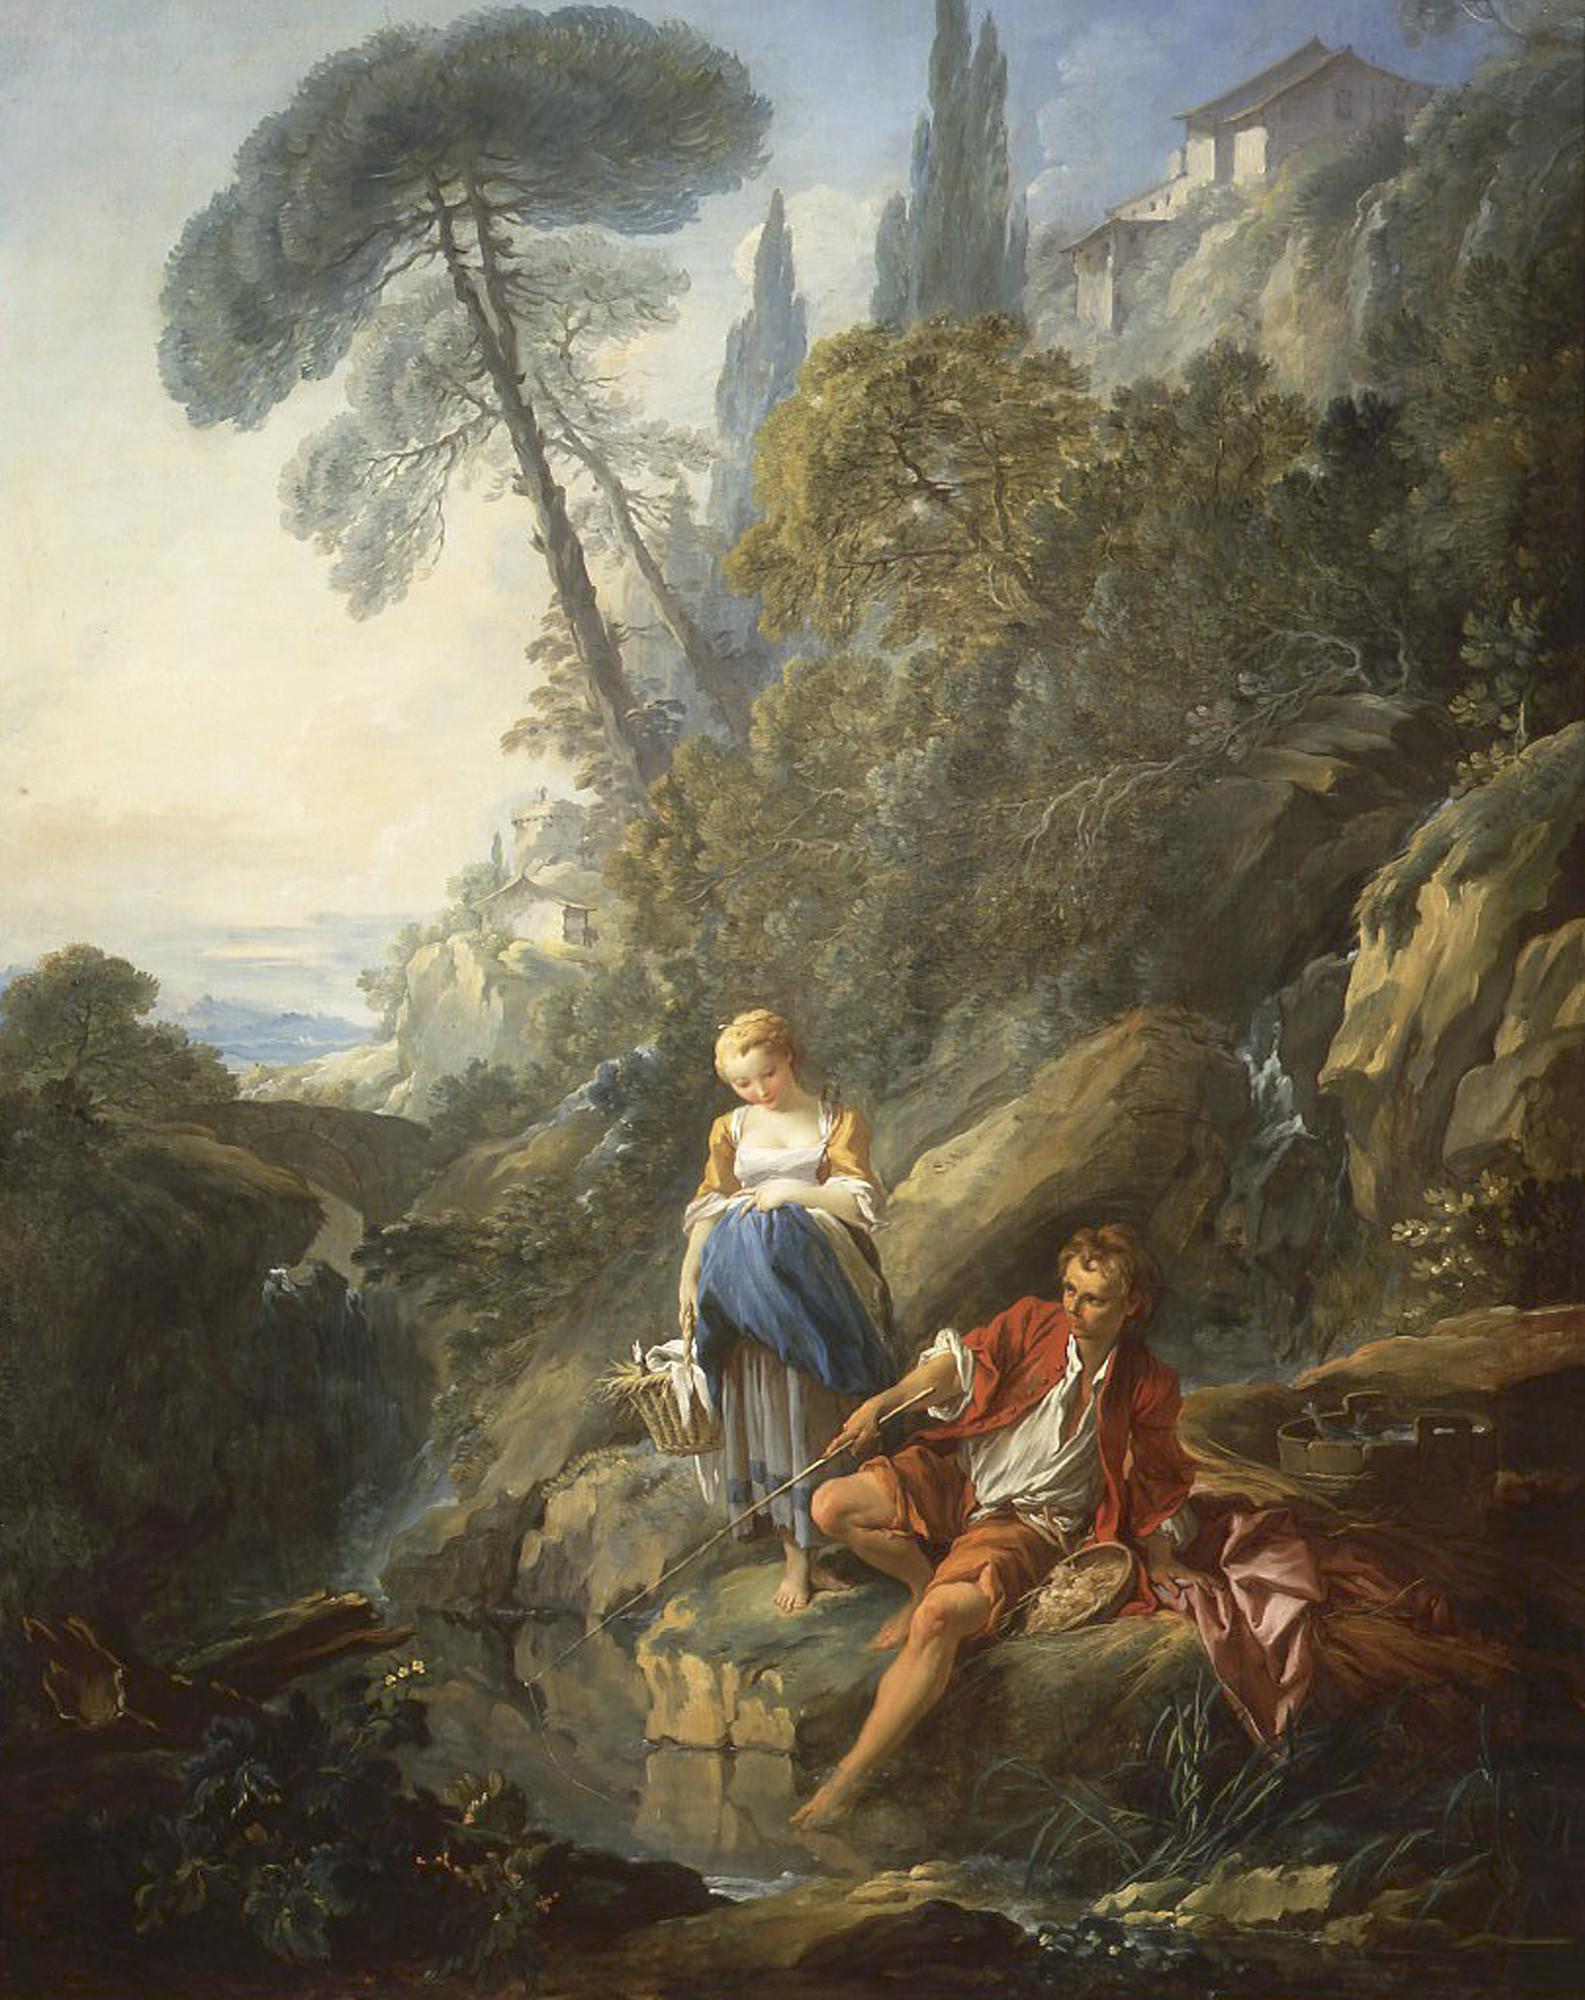 boucher 1735 ca Paysan pechant The Frick Pittsburg